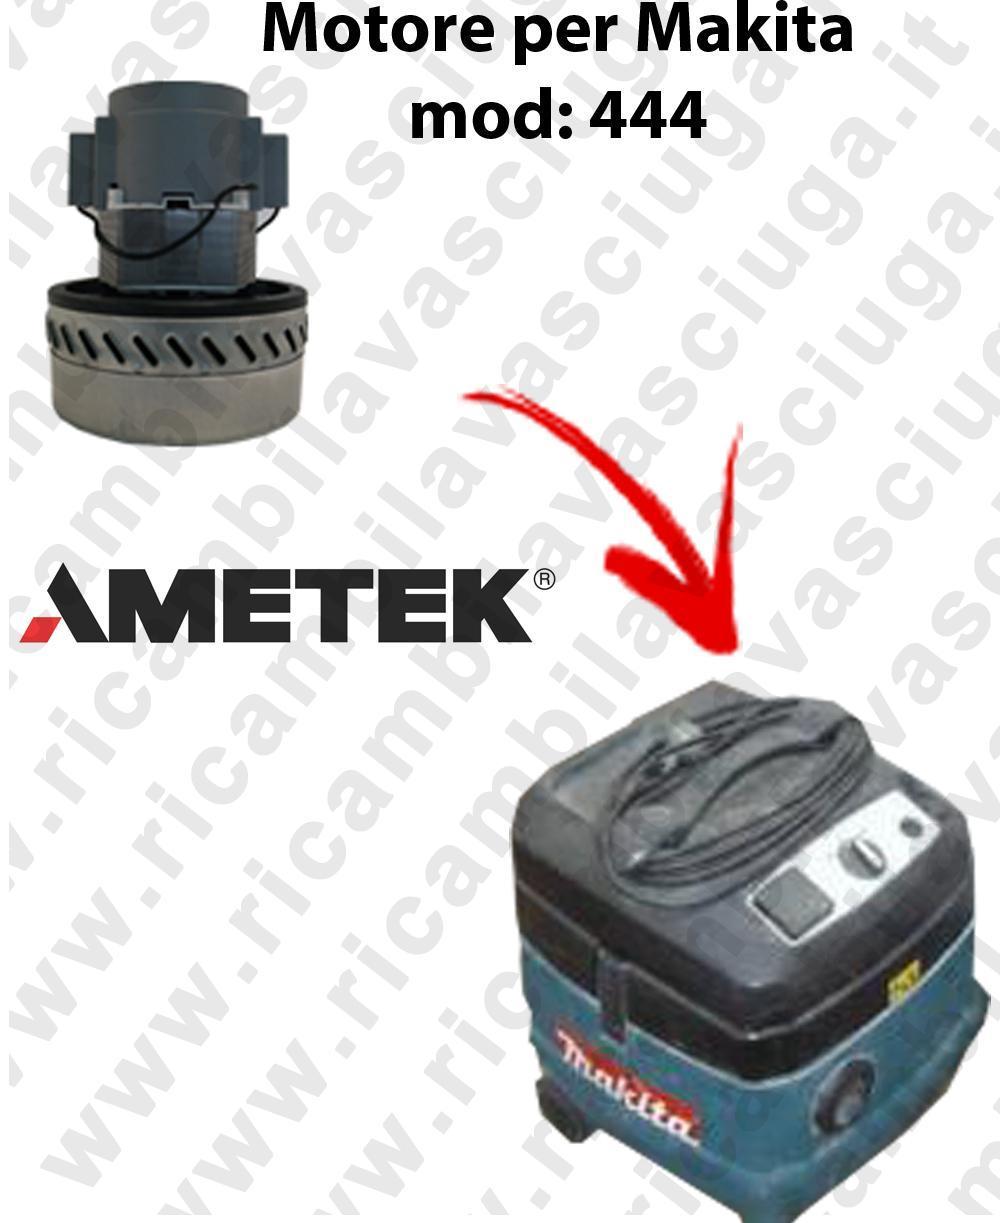 444 M Motore de aspiración AMETEK  para aspiradora MAKITA